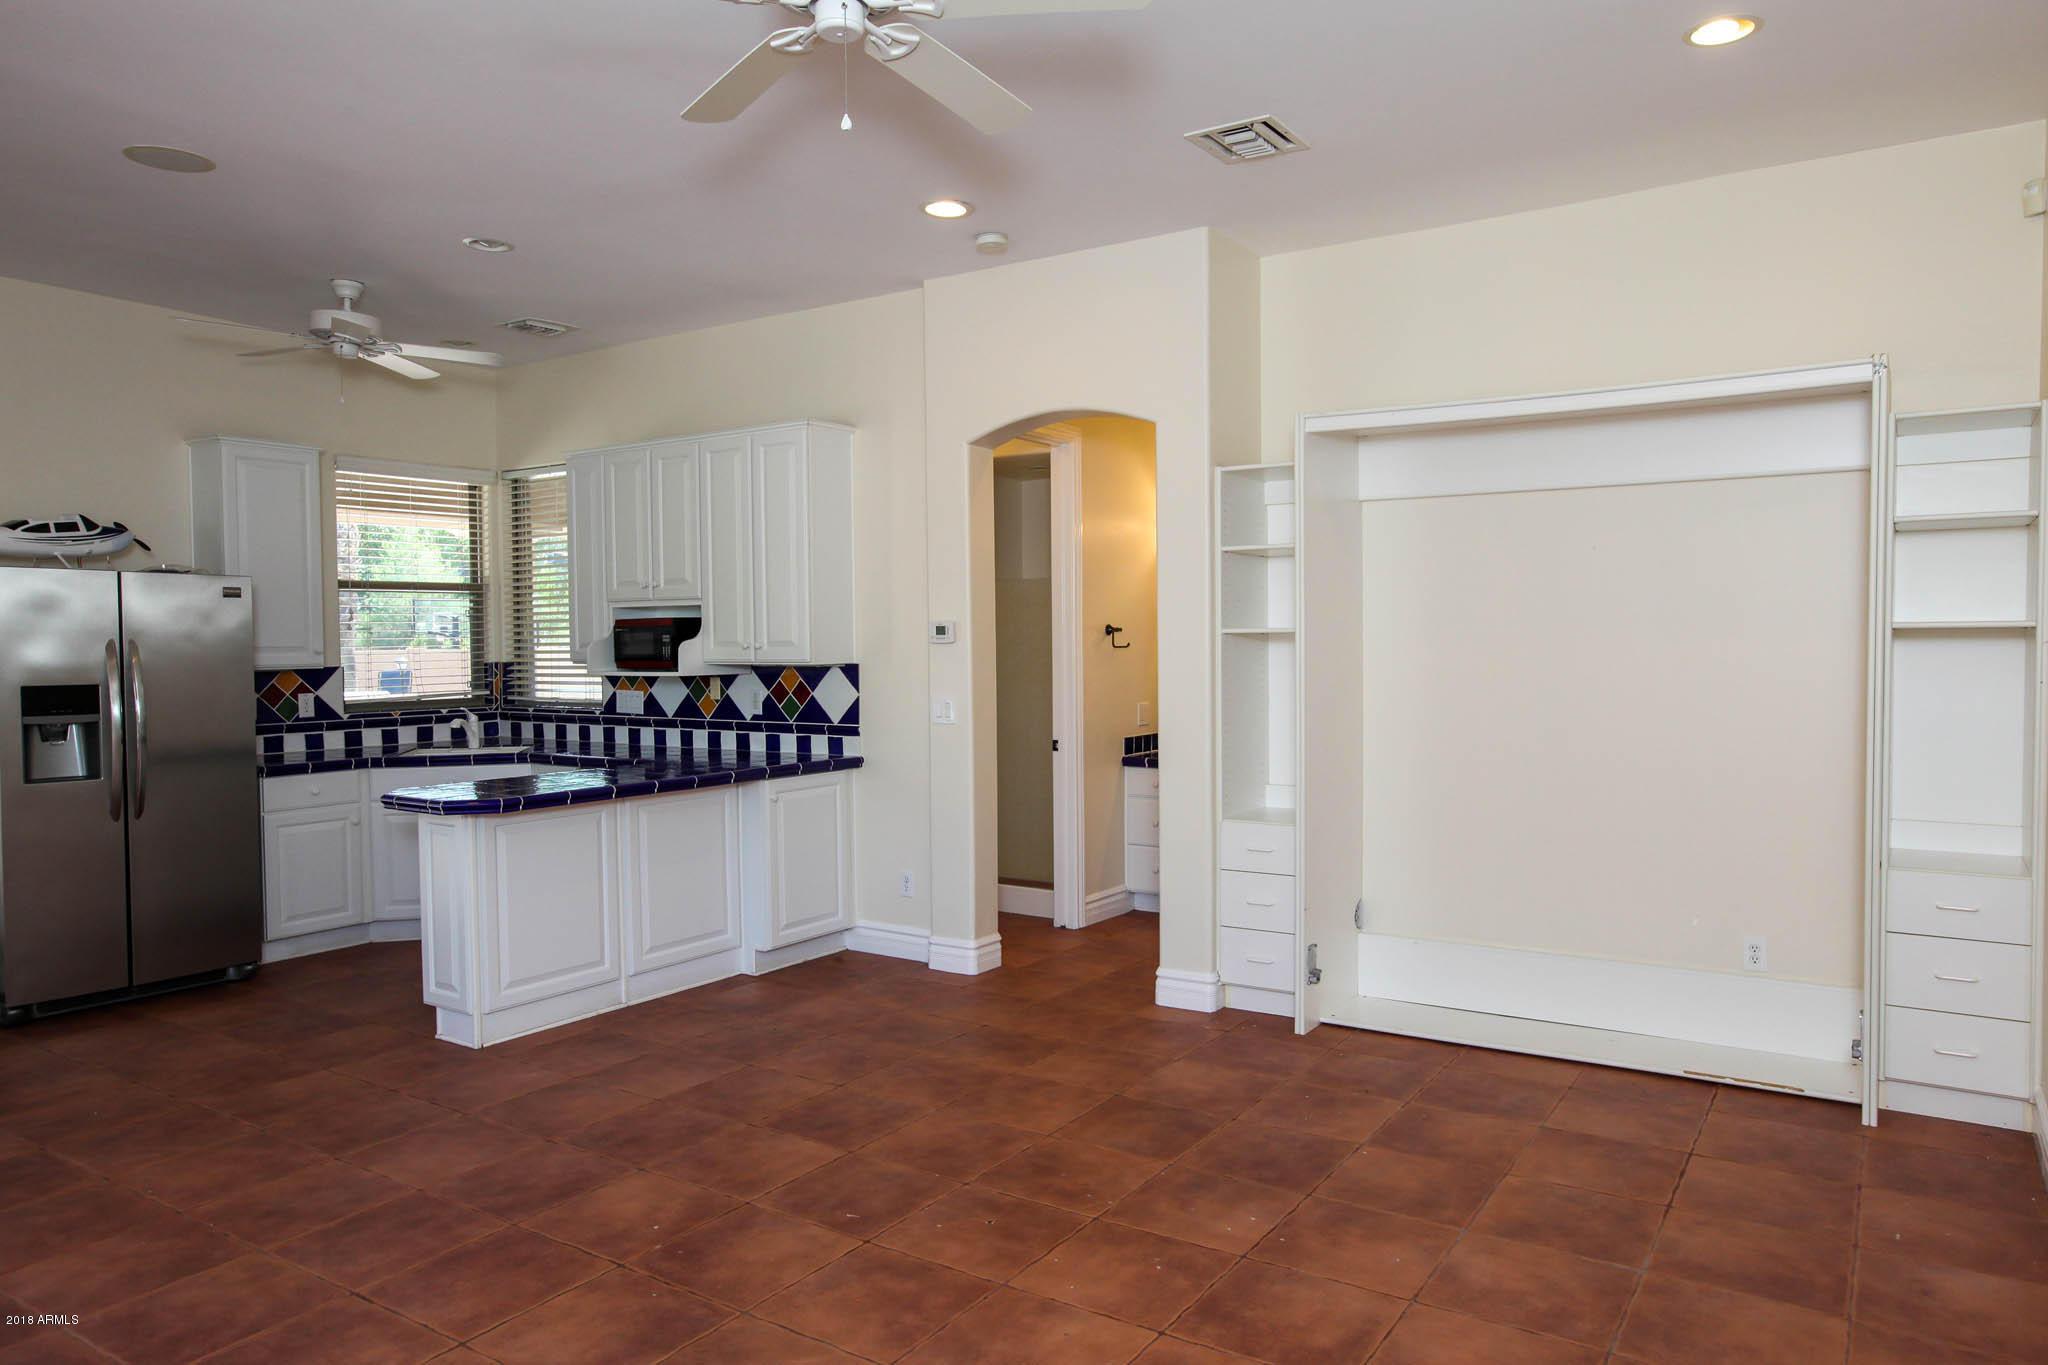 MLS 5761879 2549 E Cherrywood Place, Chandler, AZ Guest House